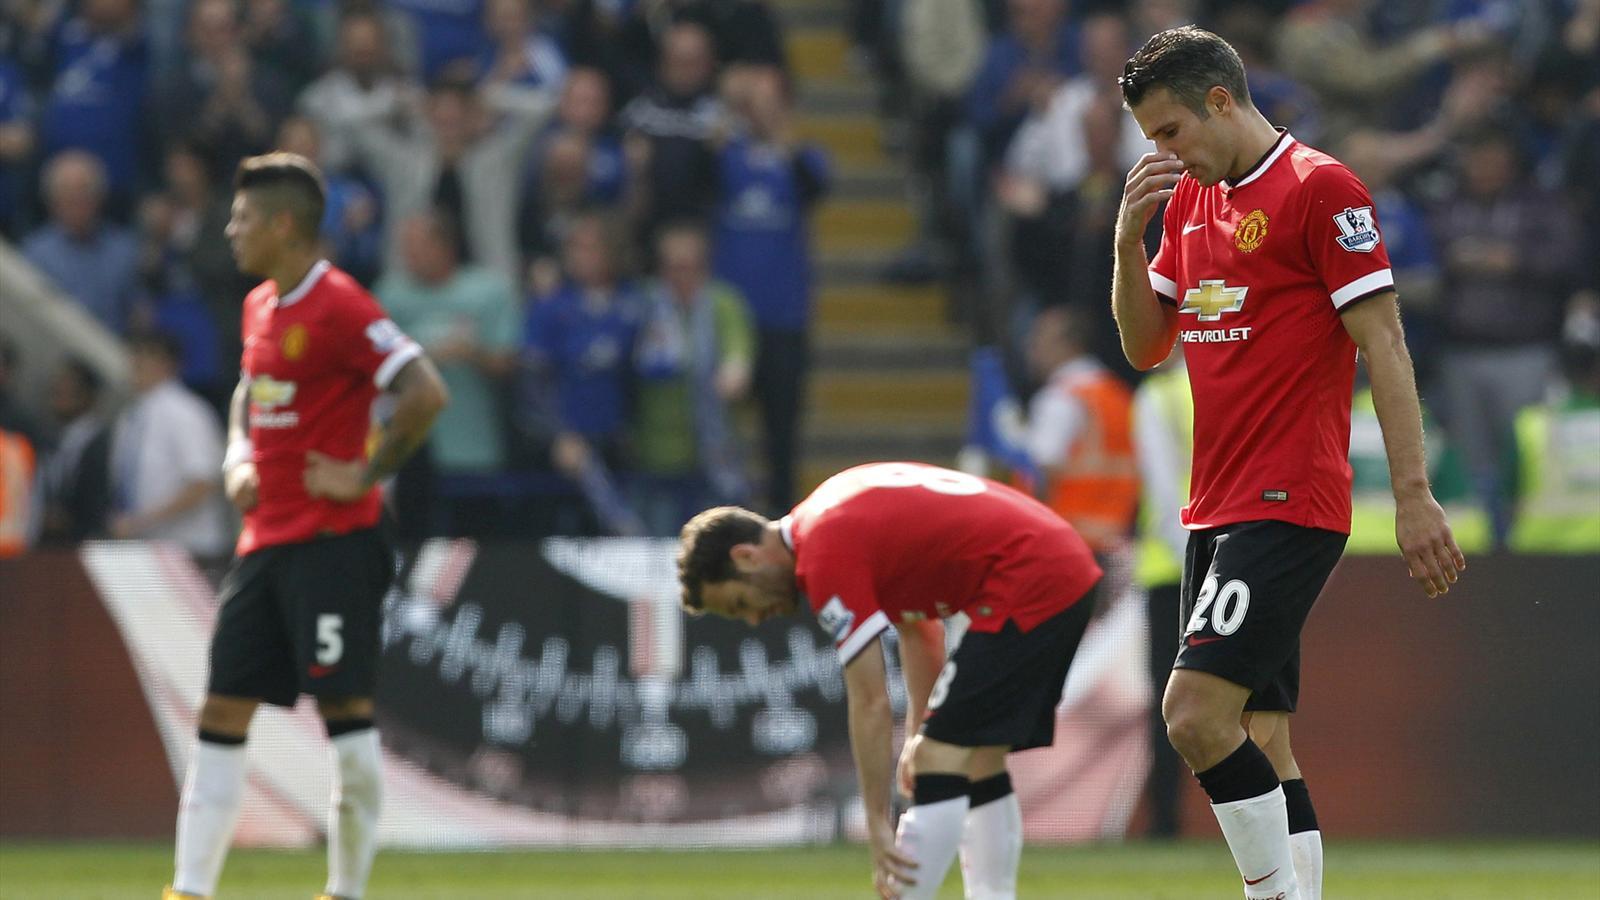 Leicester 5-3 Manchester United : Leicester humilie Manchester United, abandonné par sa défense